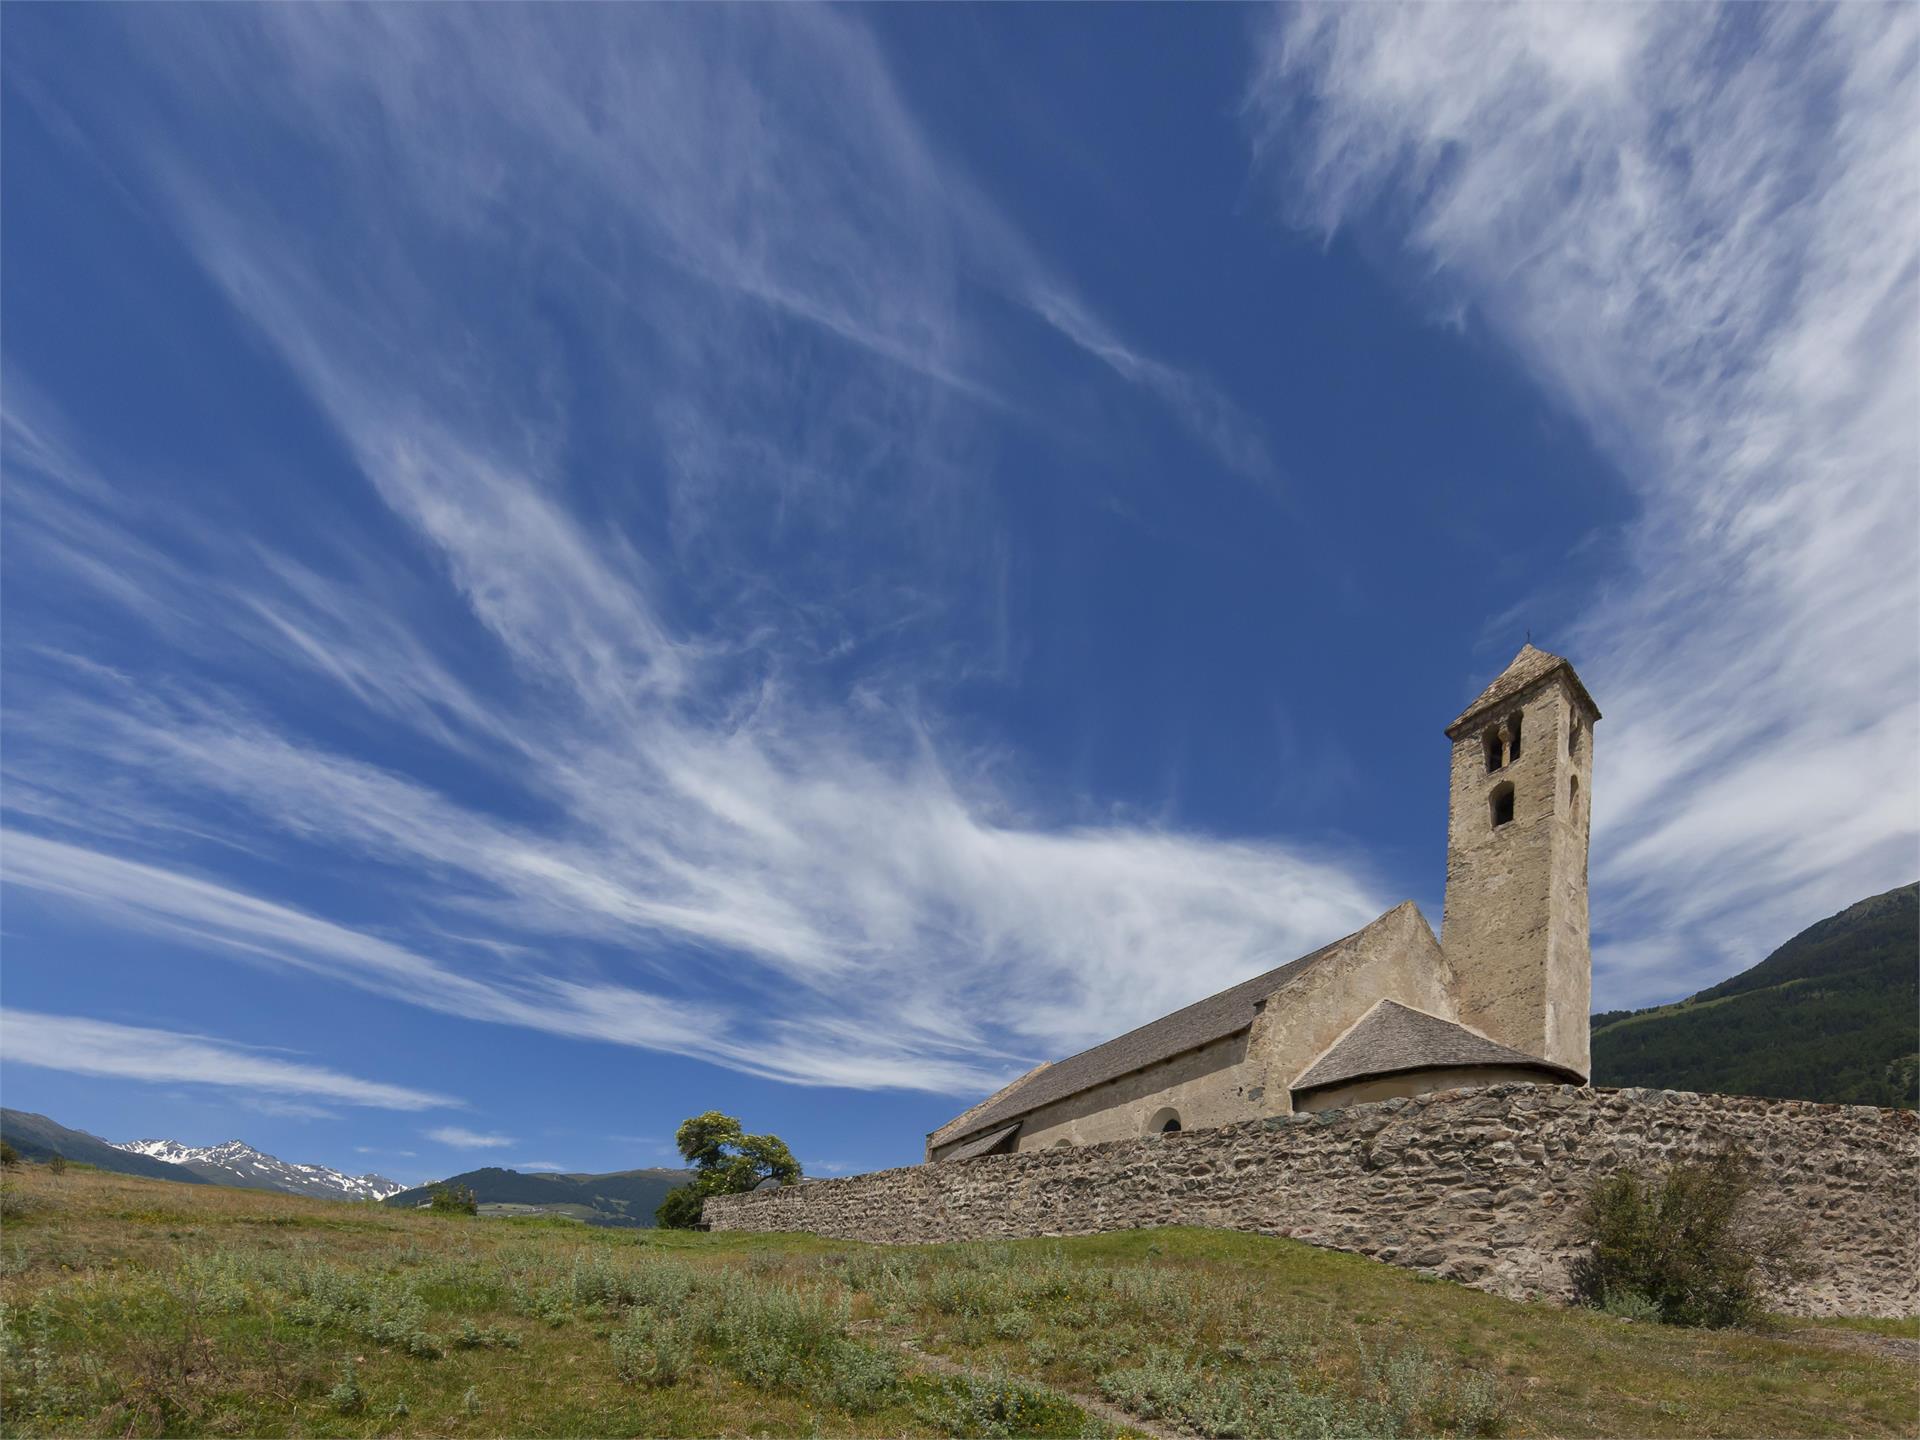 St. Veit Church